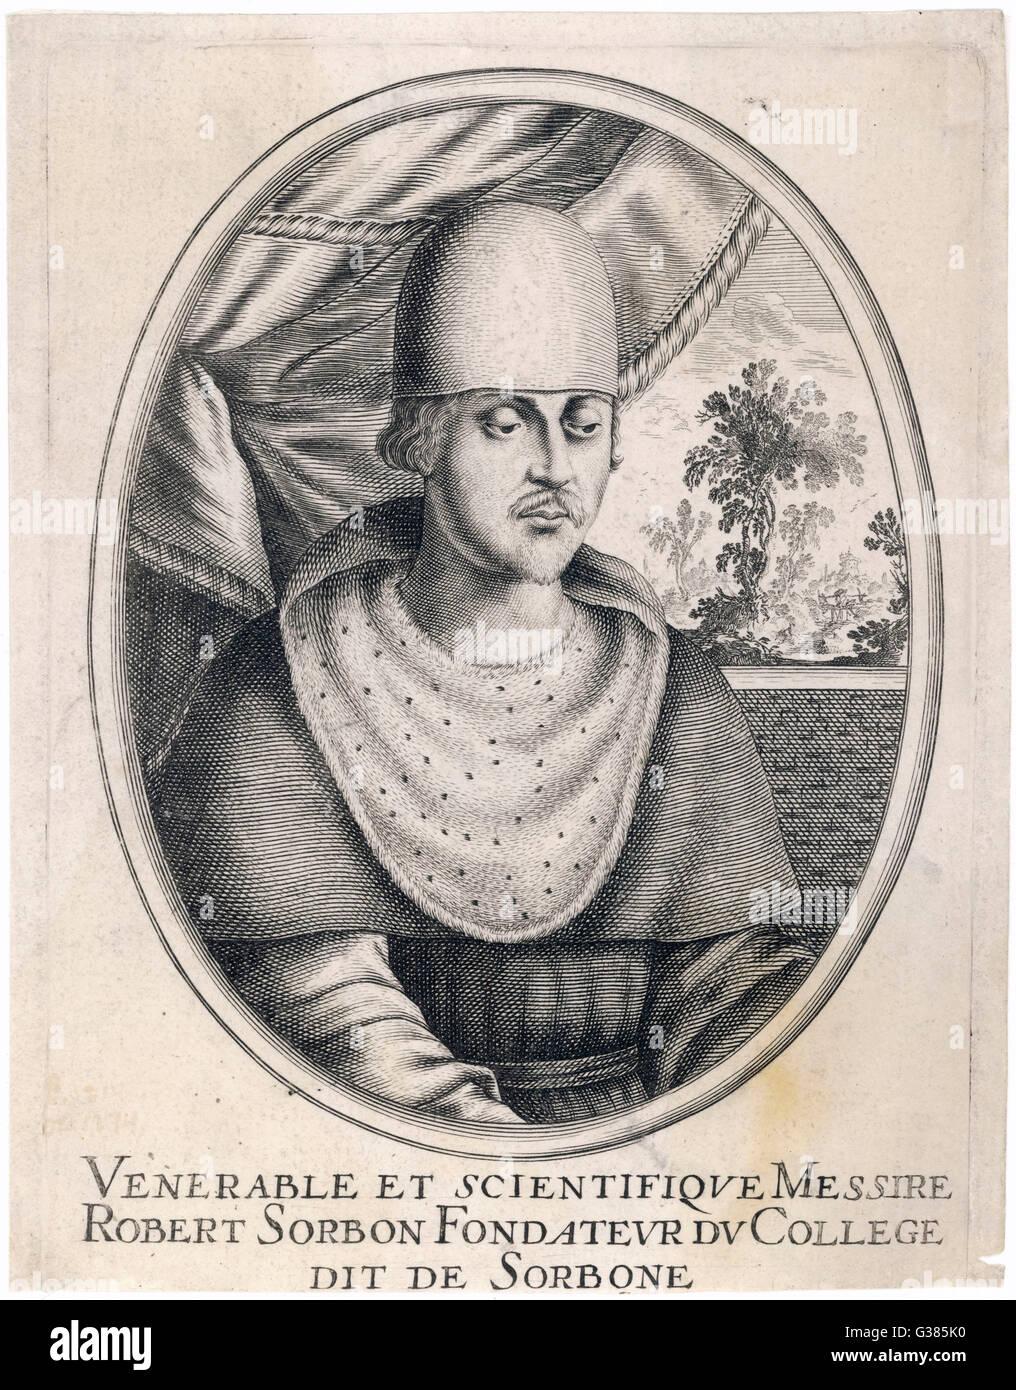 ROBERT DE SORBON  founder of the Sorbonne,  university at Paris       Date: 1201 - 1274 - Stock Image